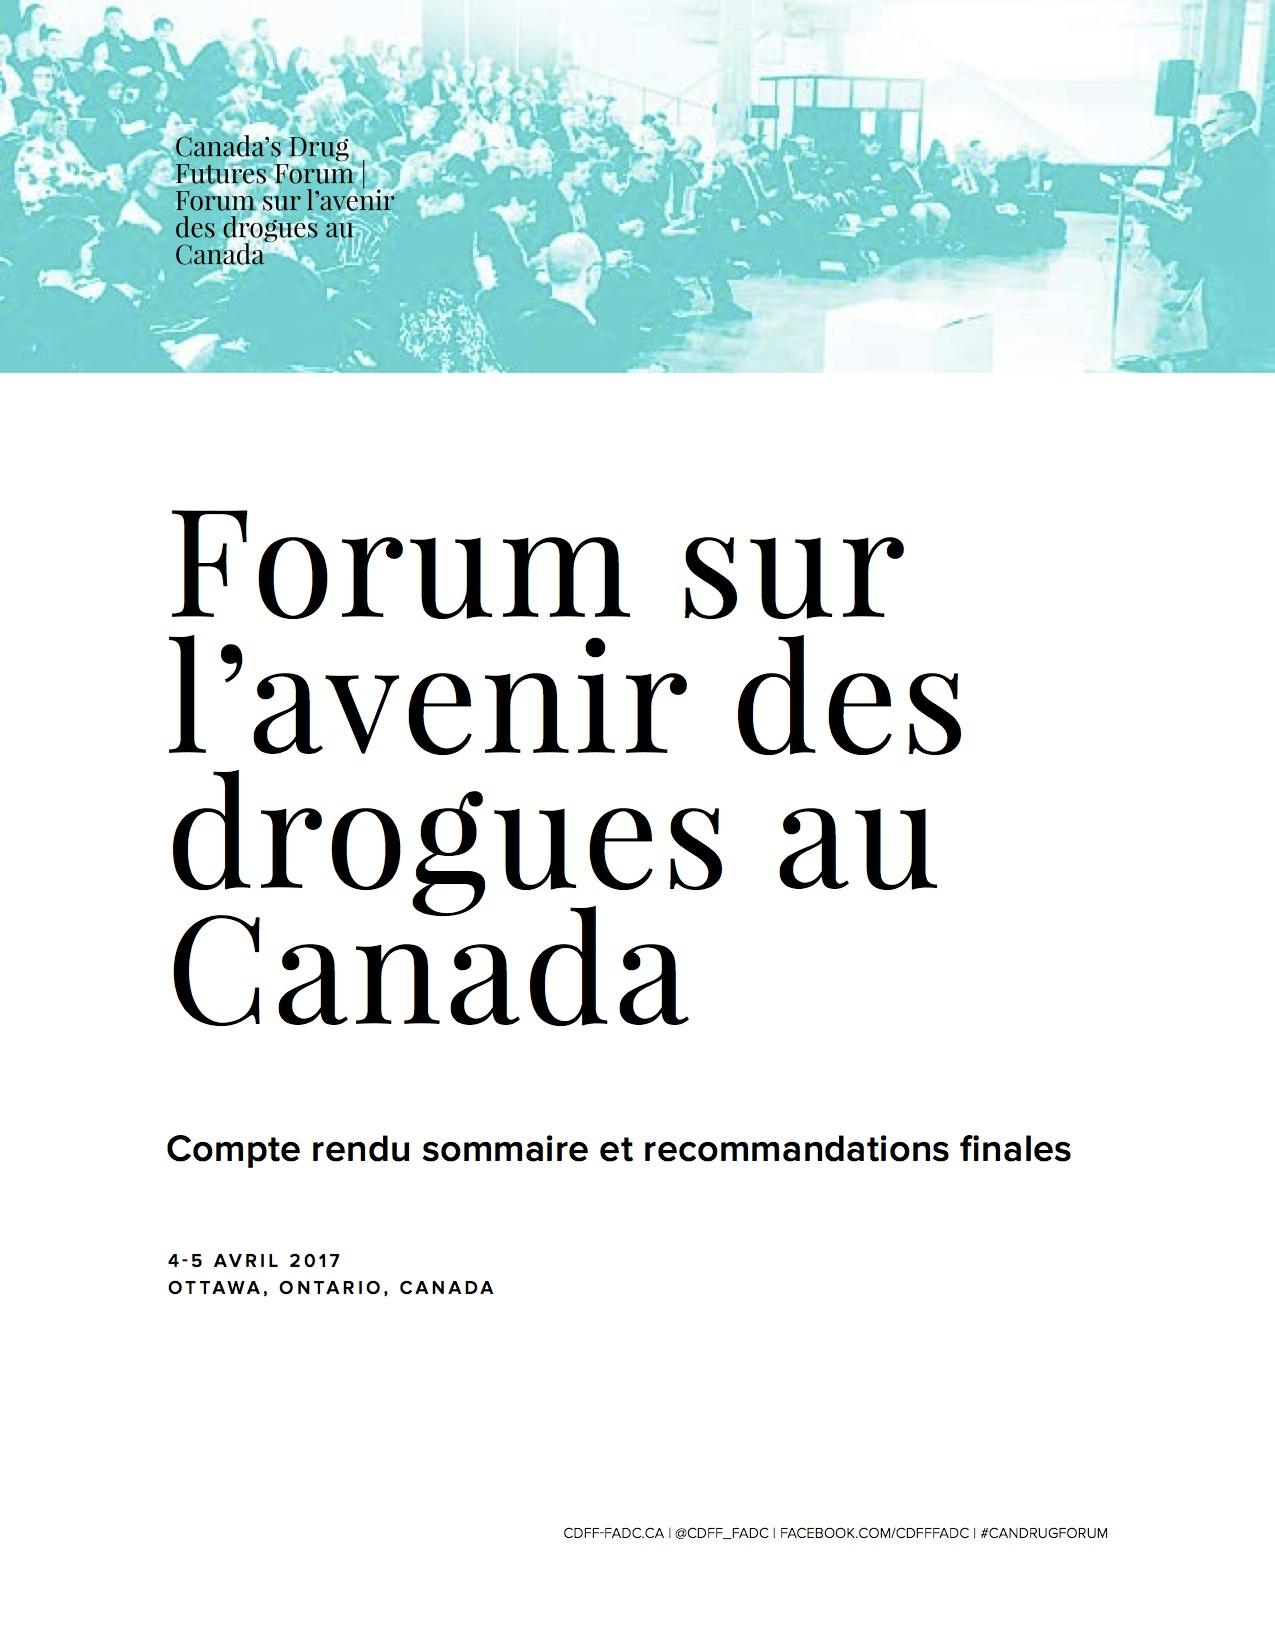 CDFF FR Report_For Final Review_Update.jpg